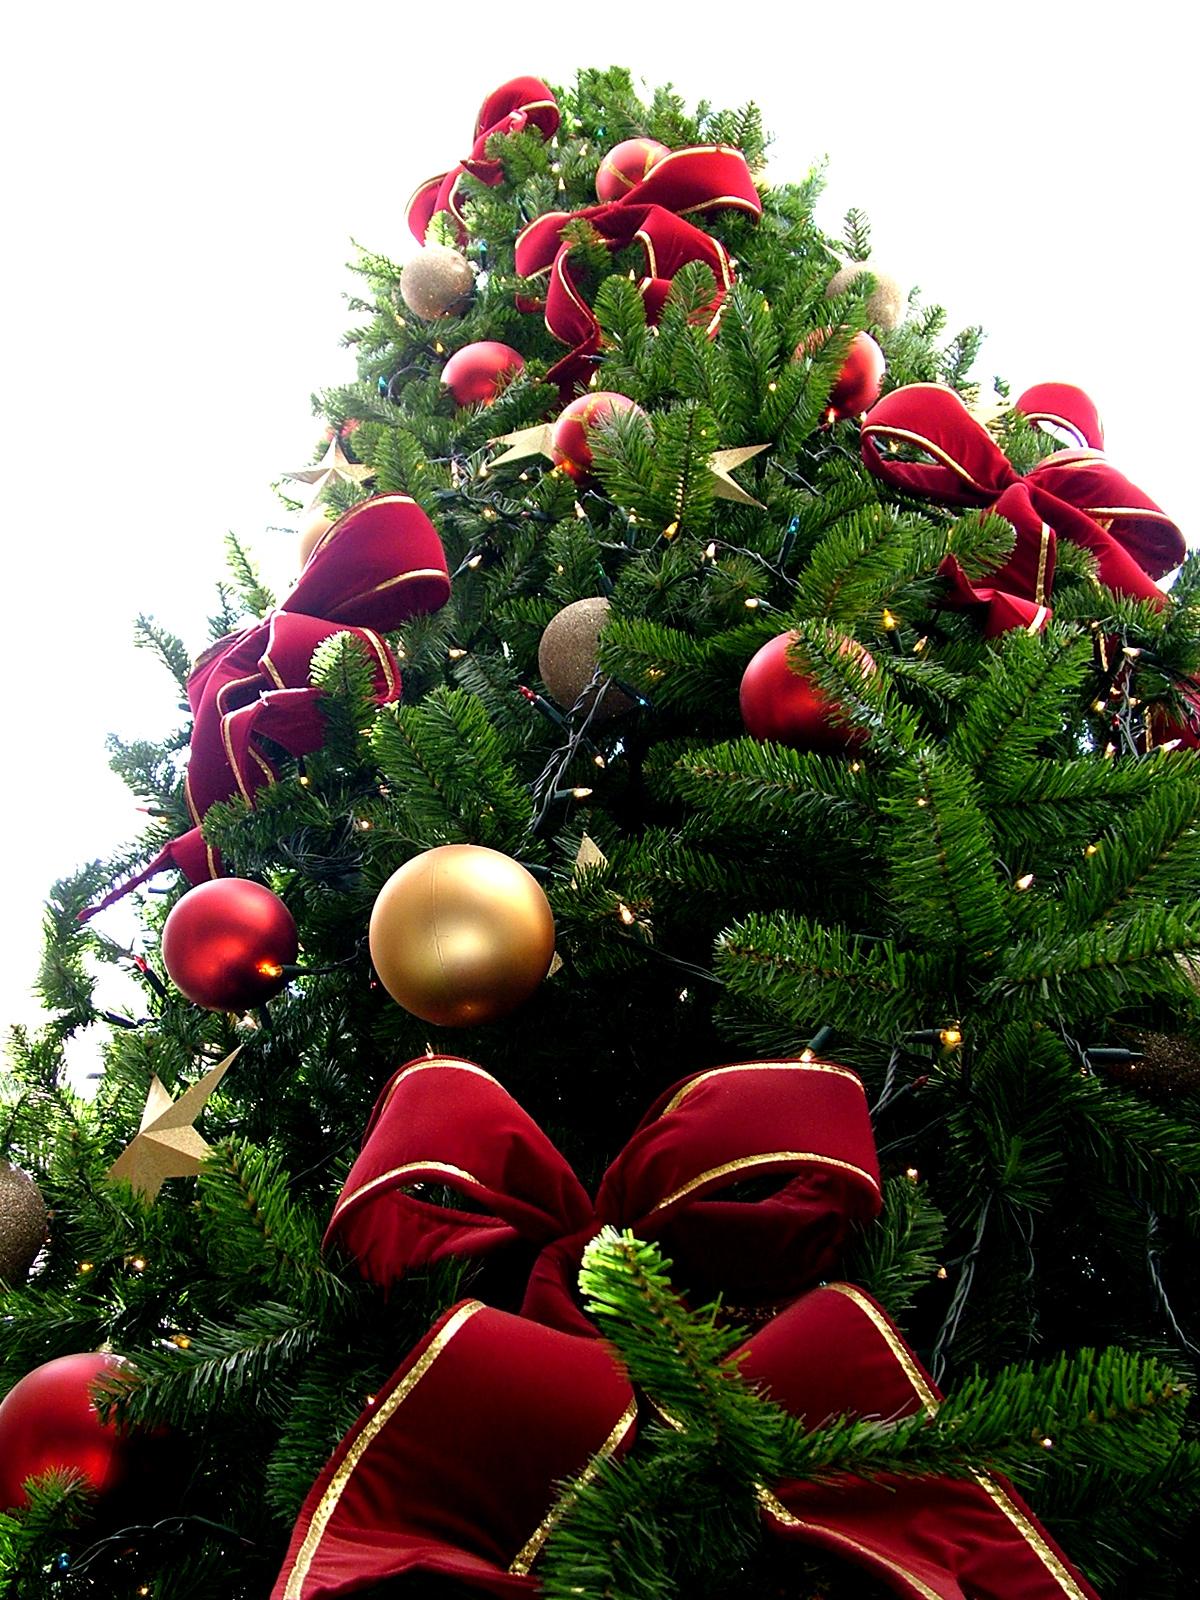 ChristmasTree141123-01